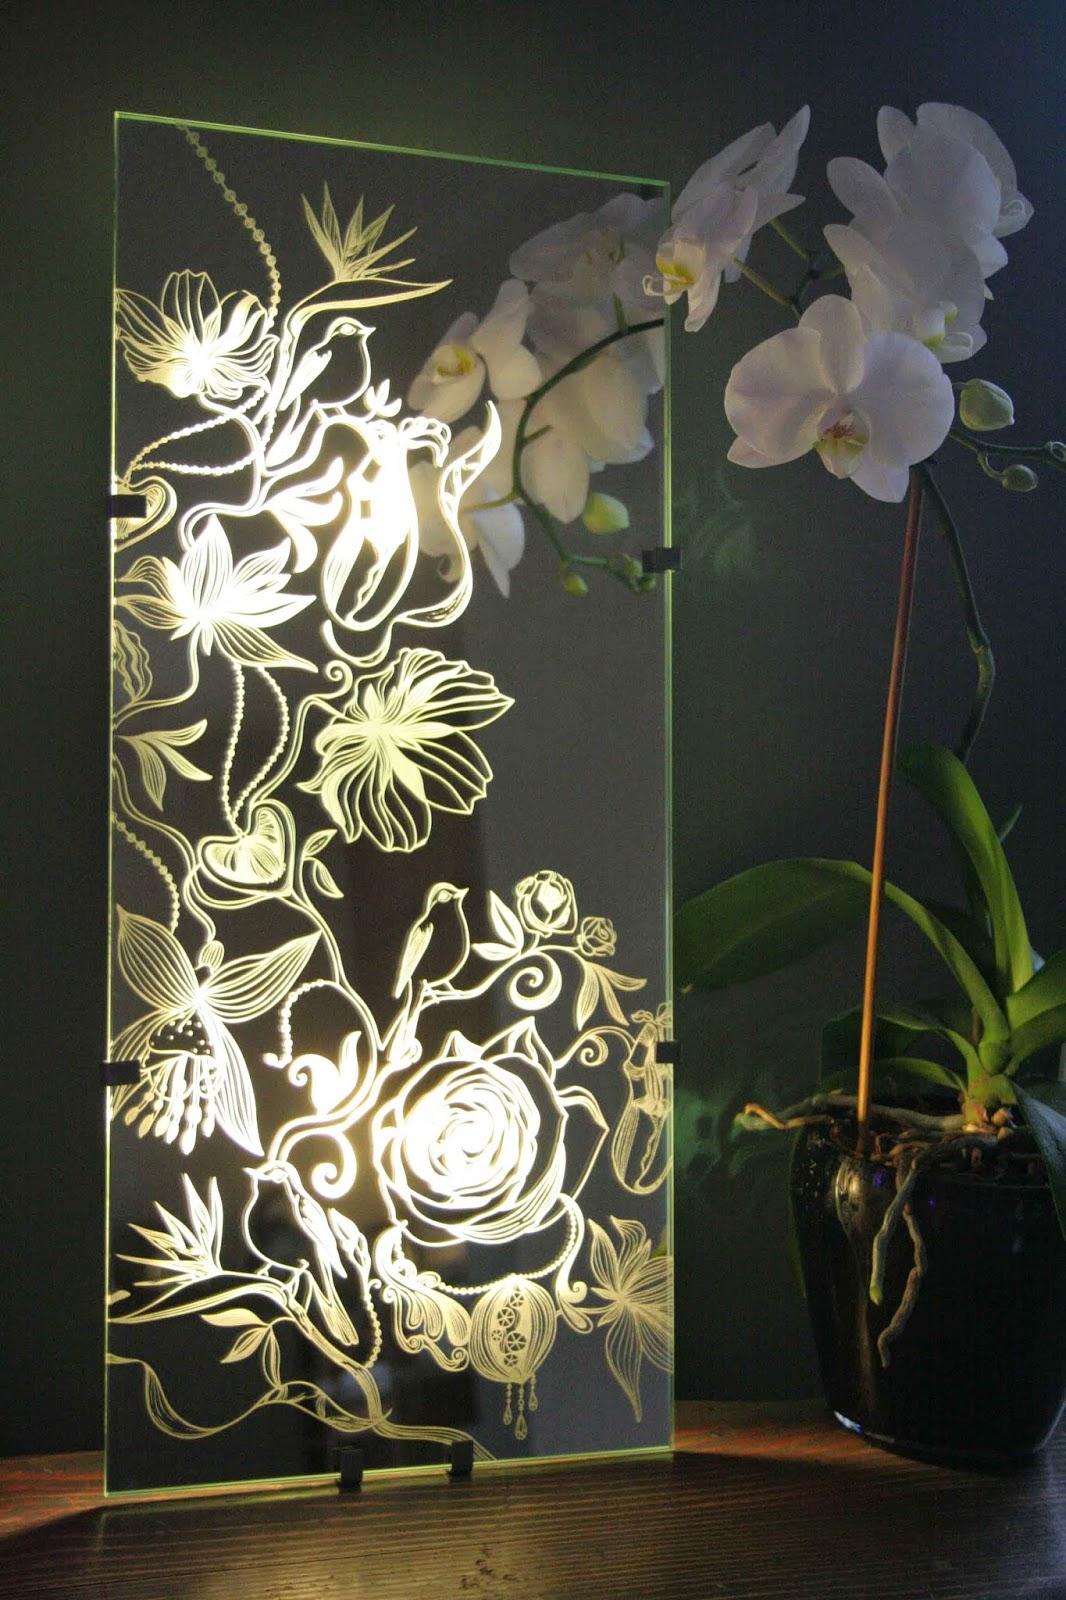 Room Lighting Design Software: Fabrication, The Craftiest Place In Leeds: Spotlight On